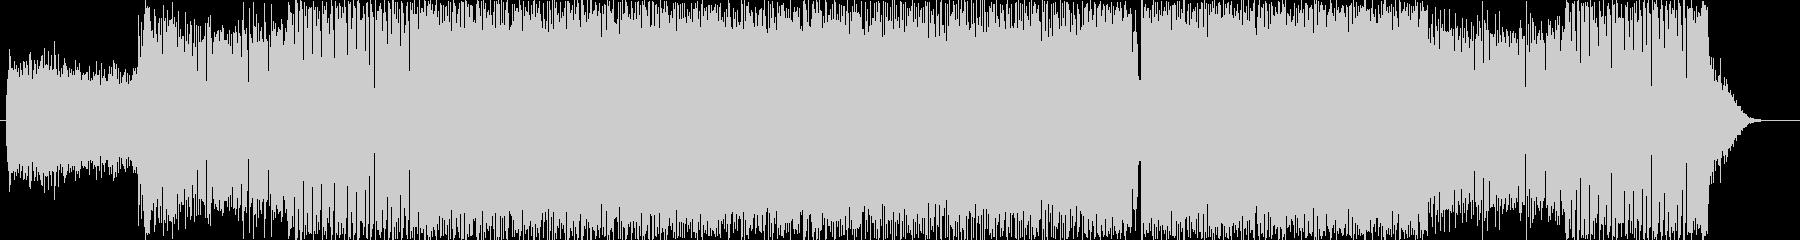 Tranceアレンジの曲です。mp3 …の未再生の波形